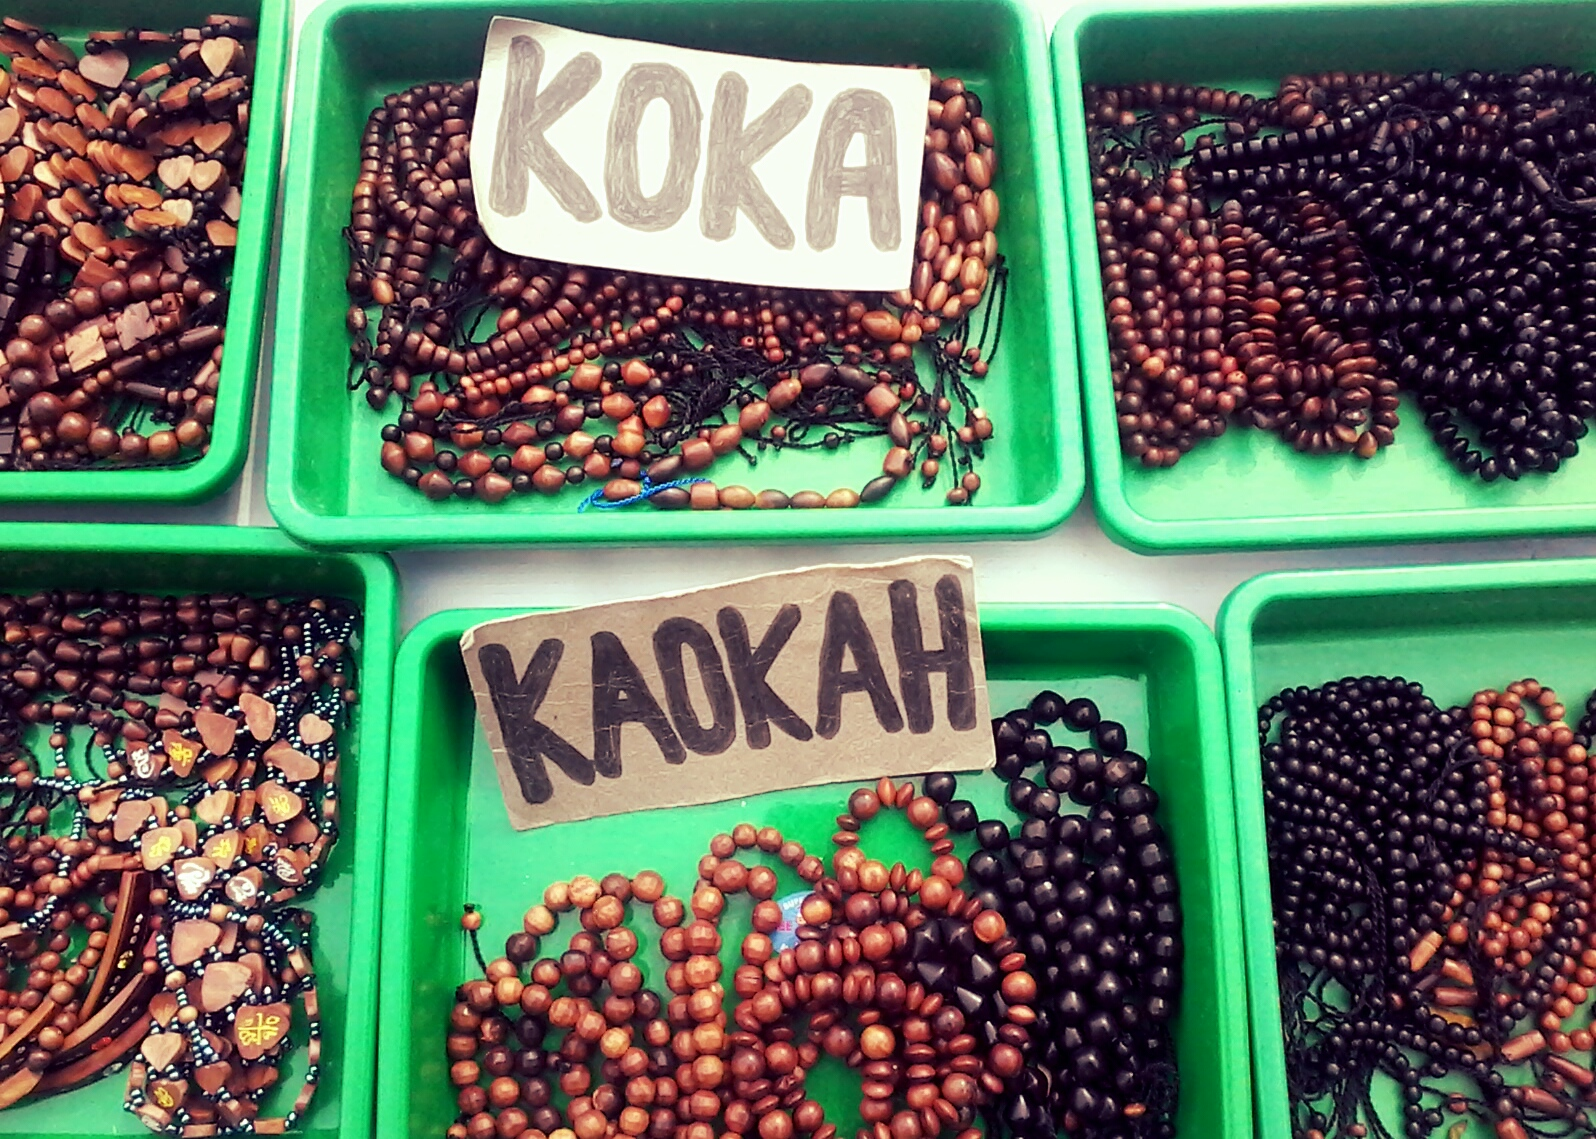 travelplusindonesia  Ini yang Bikin Aksesoris Kayu Kokka Laris Manis ... 86da17945b